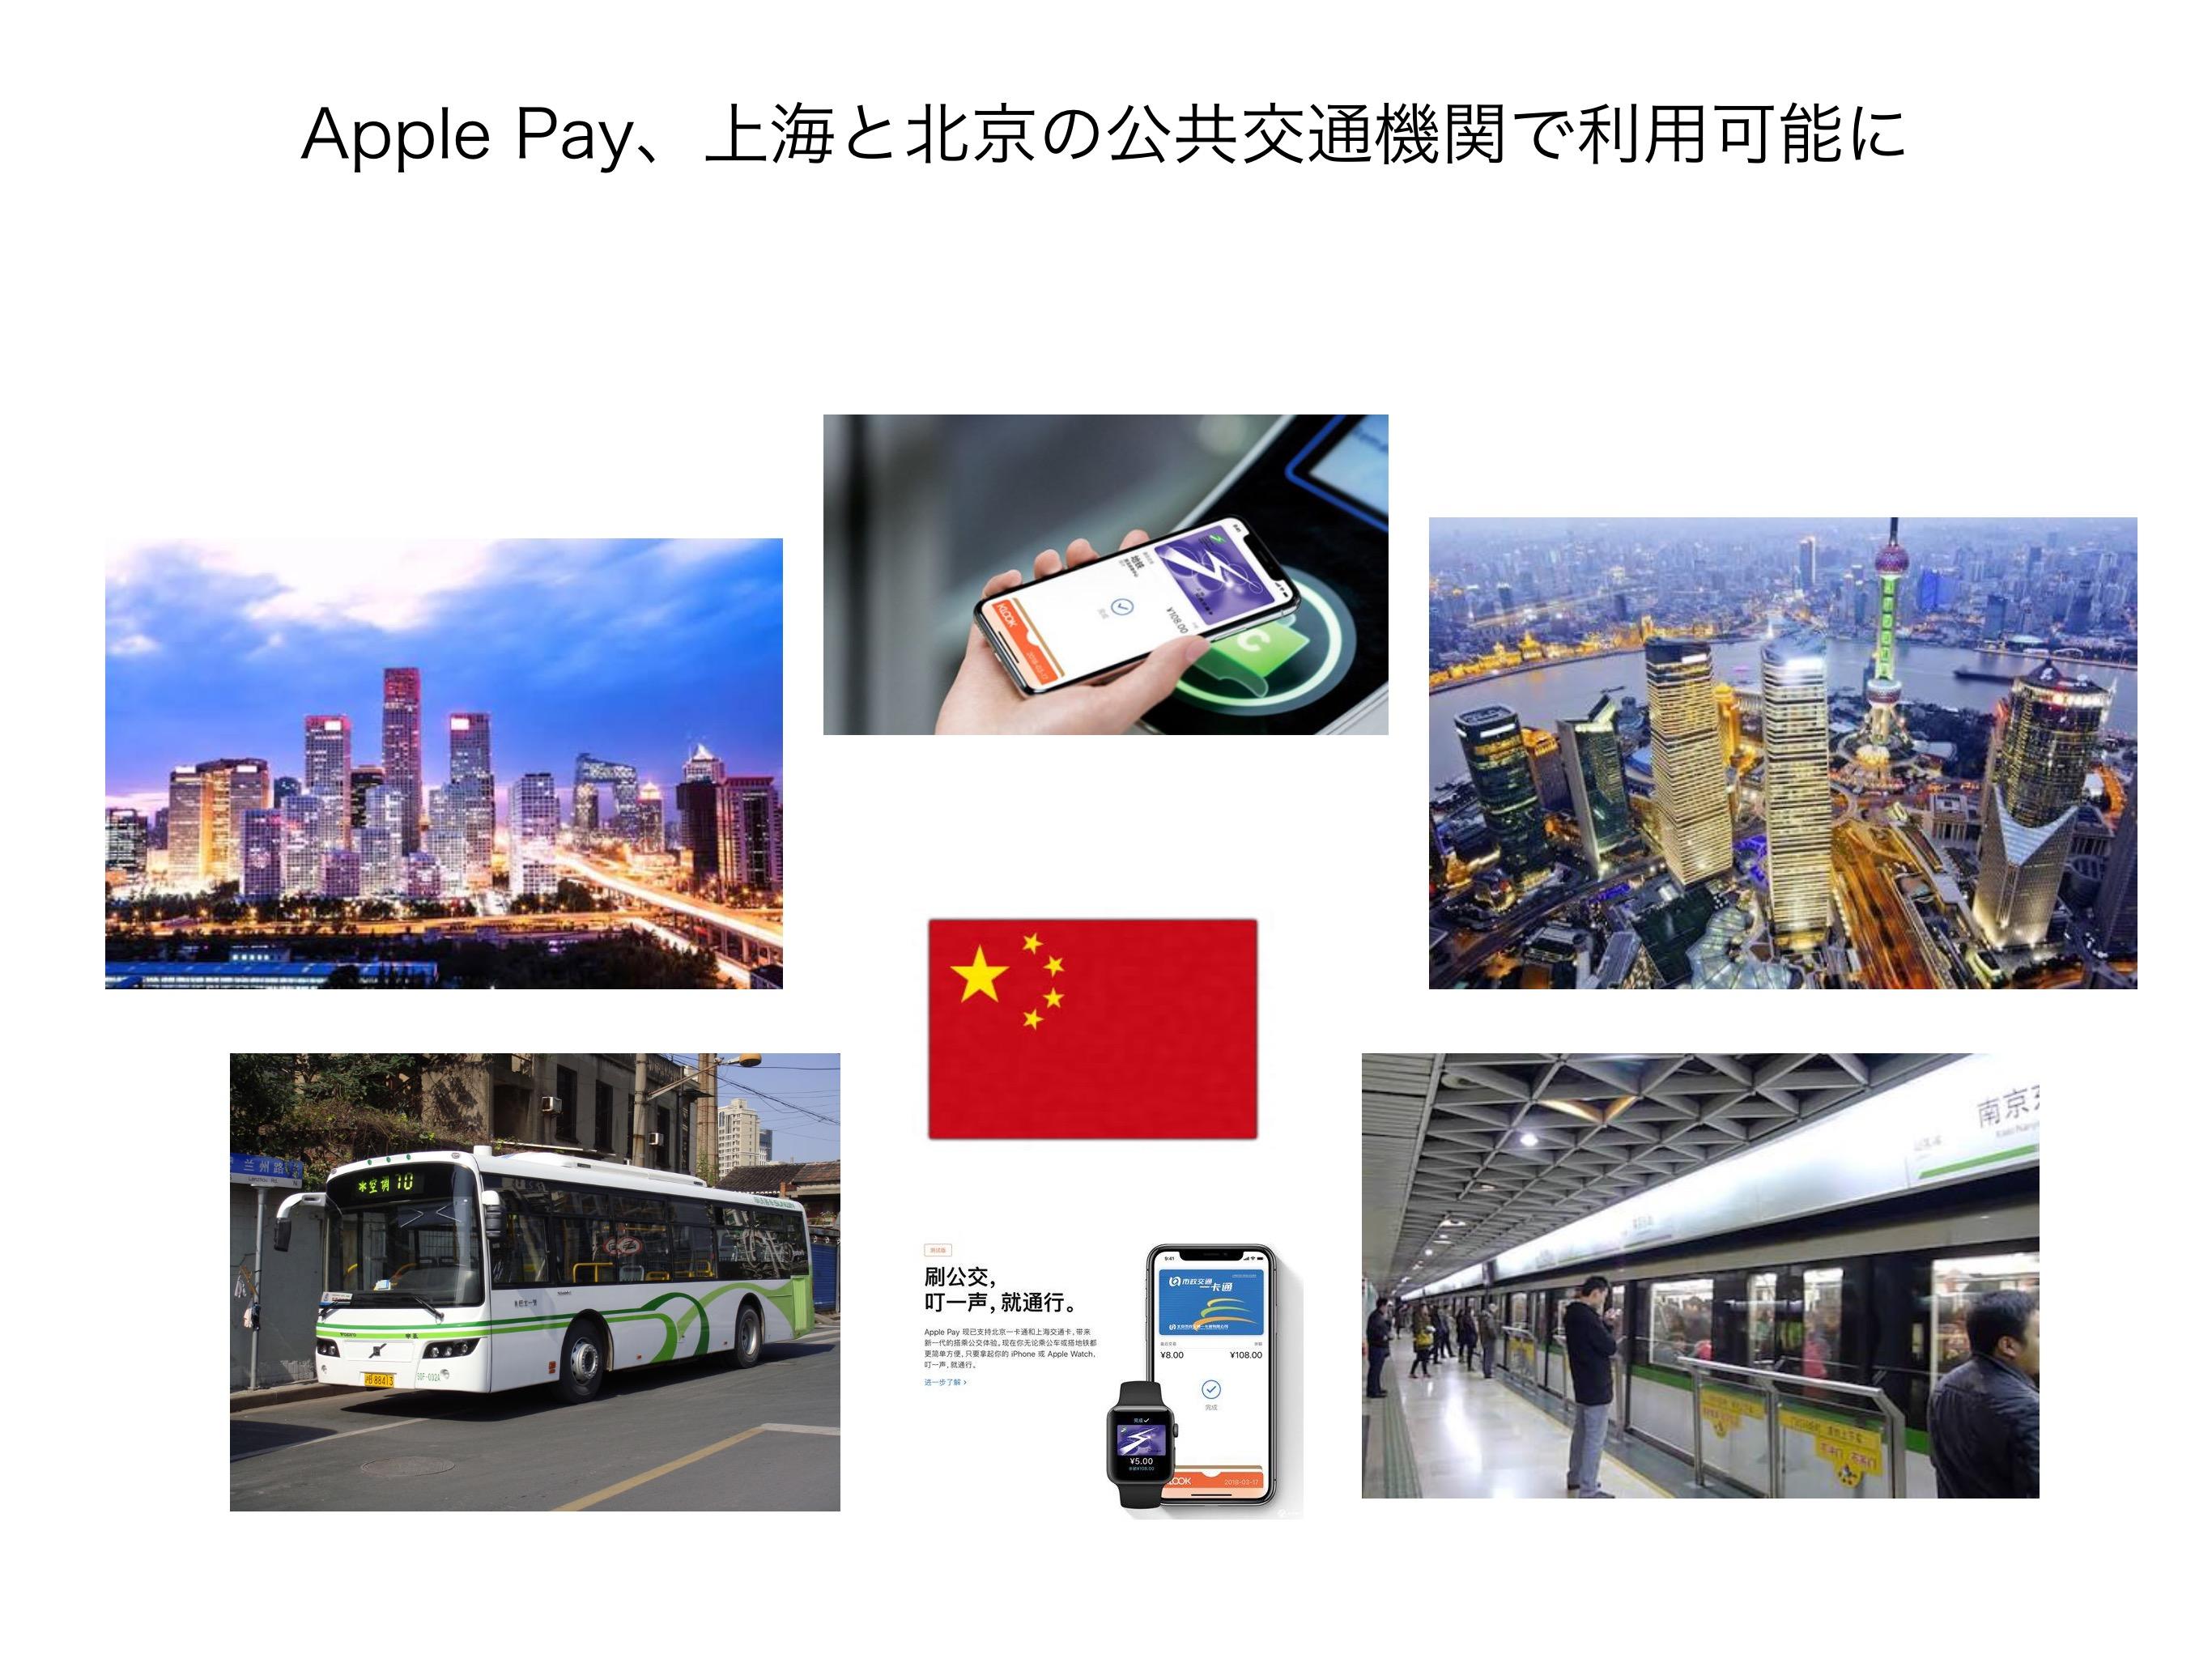 Apple Pay 中国